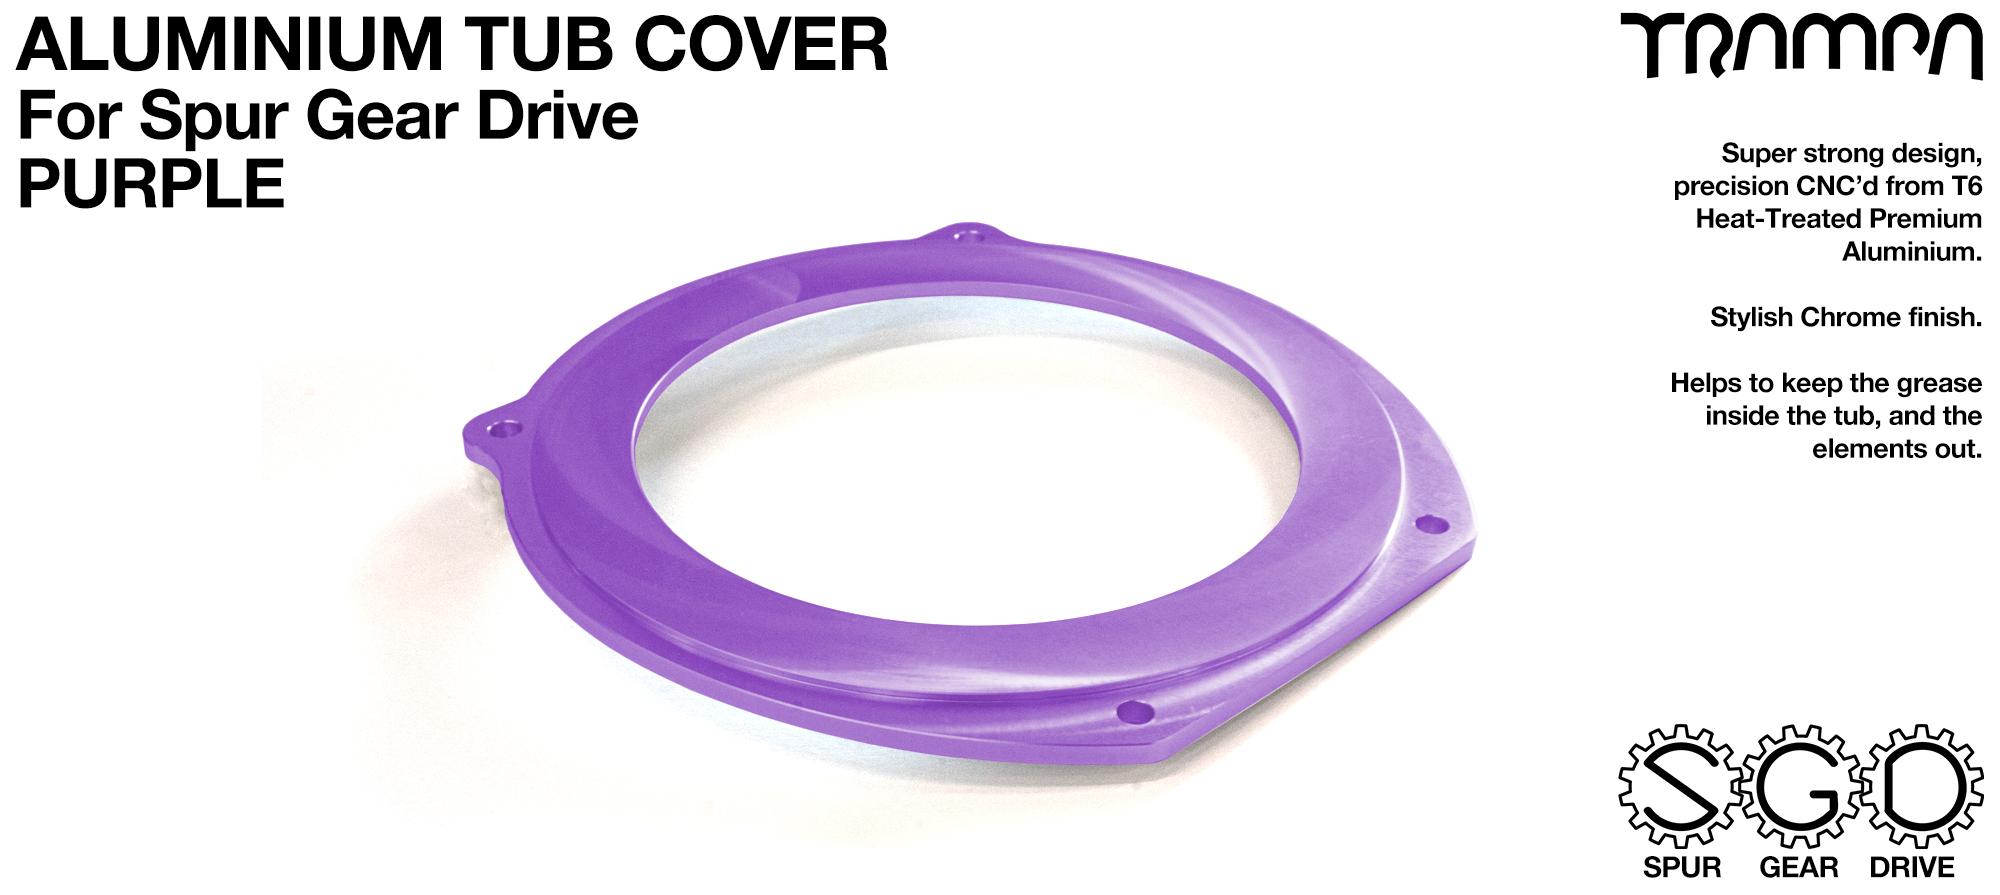 TRAMPA MKII Spur Gear Drive T6 Aluminium Tub Cover - PURPLE